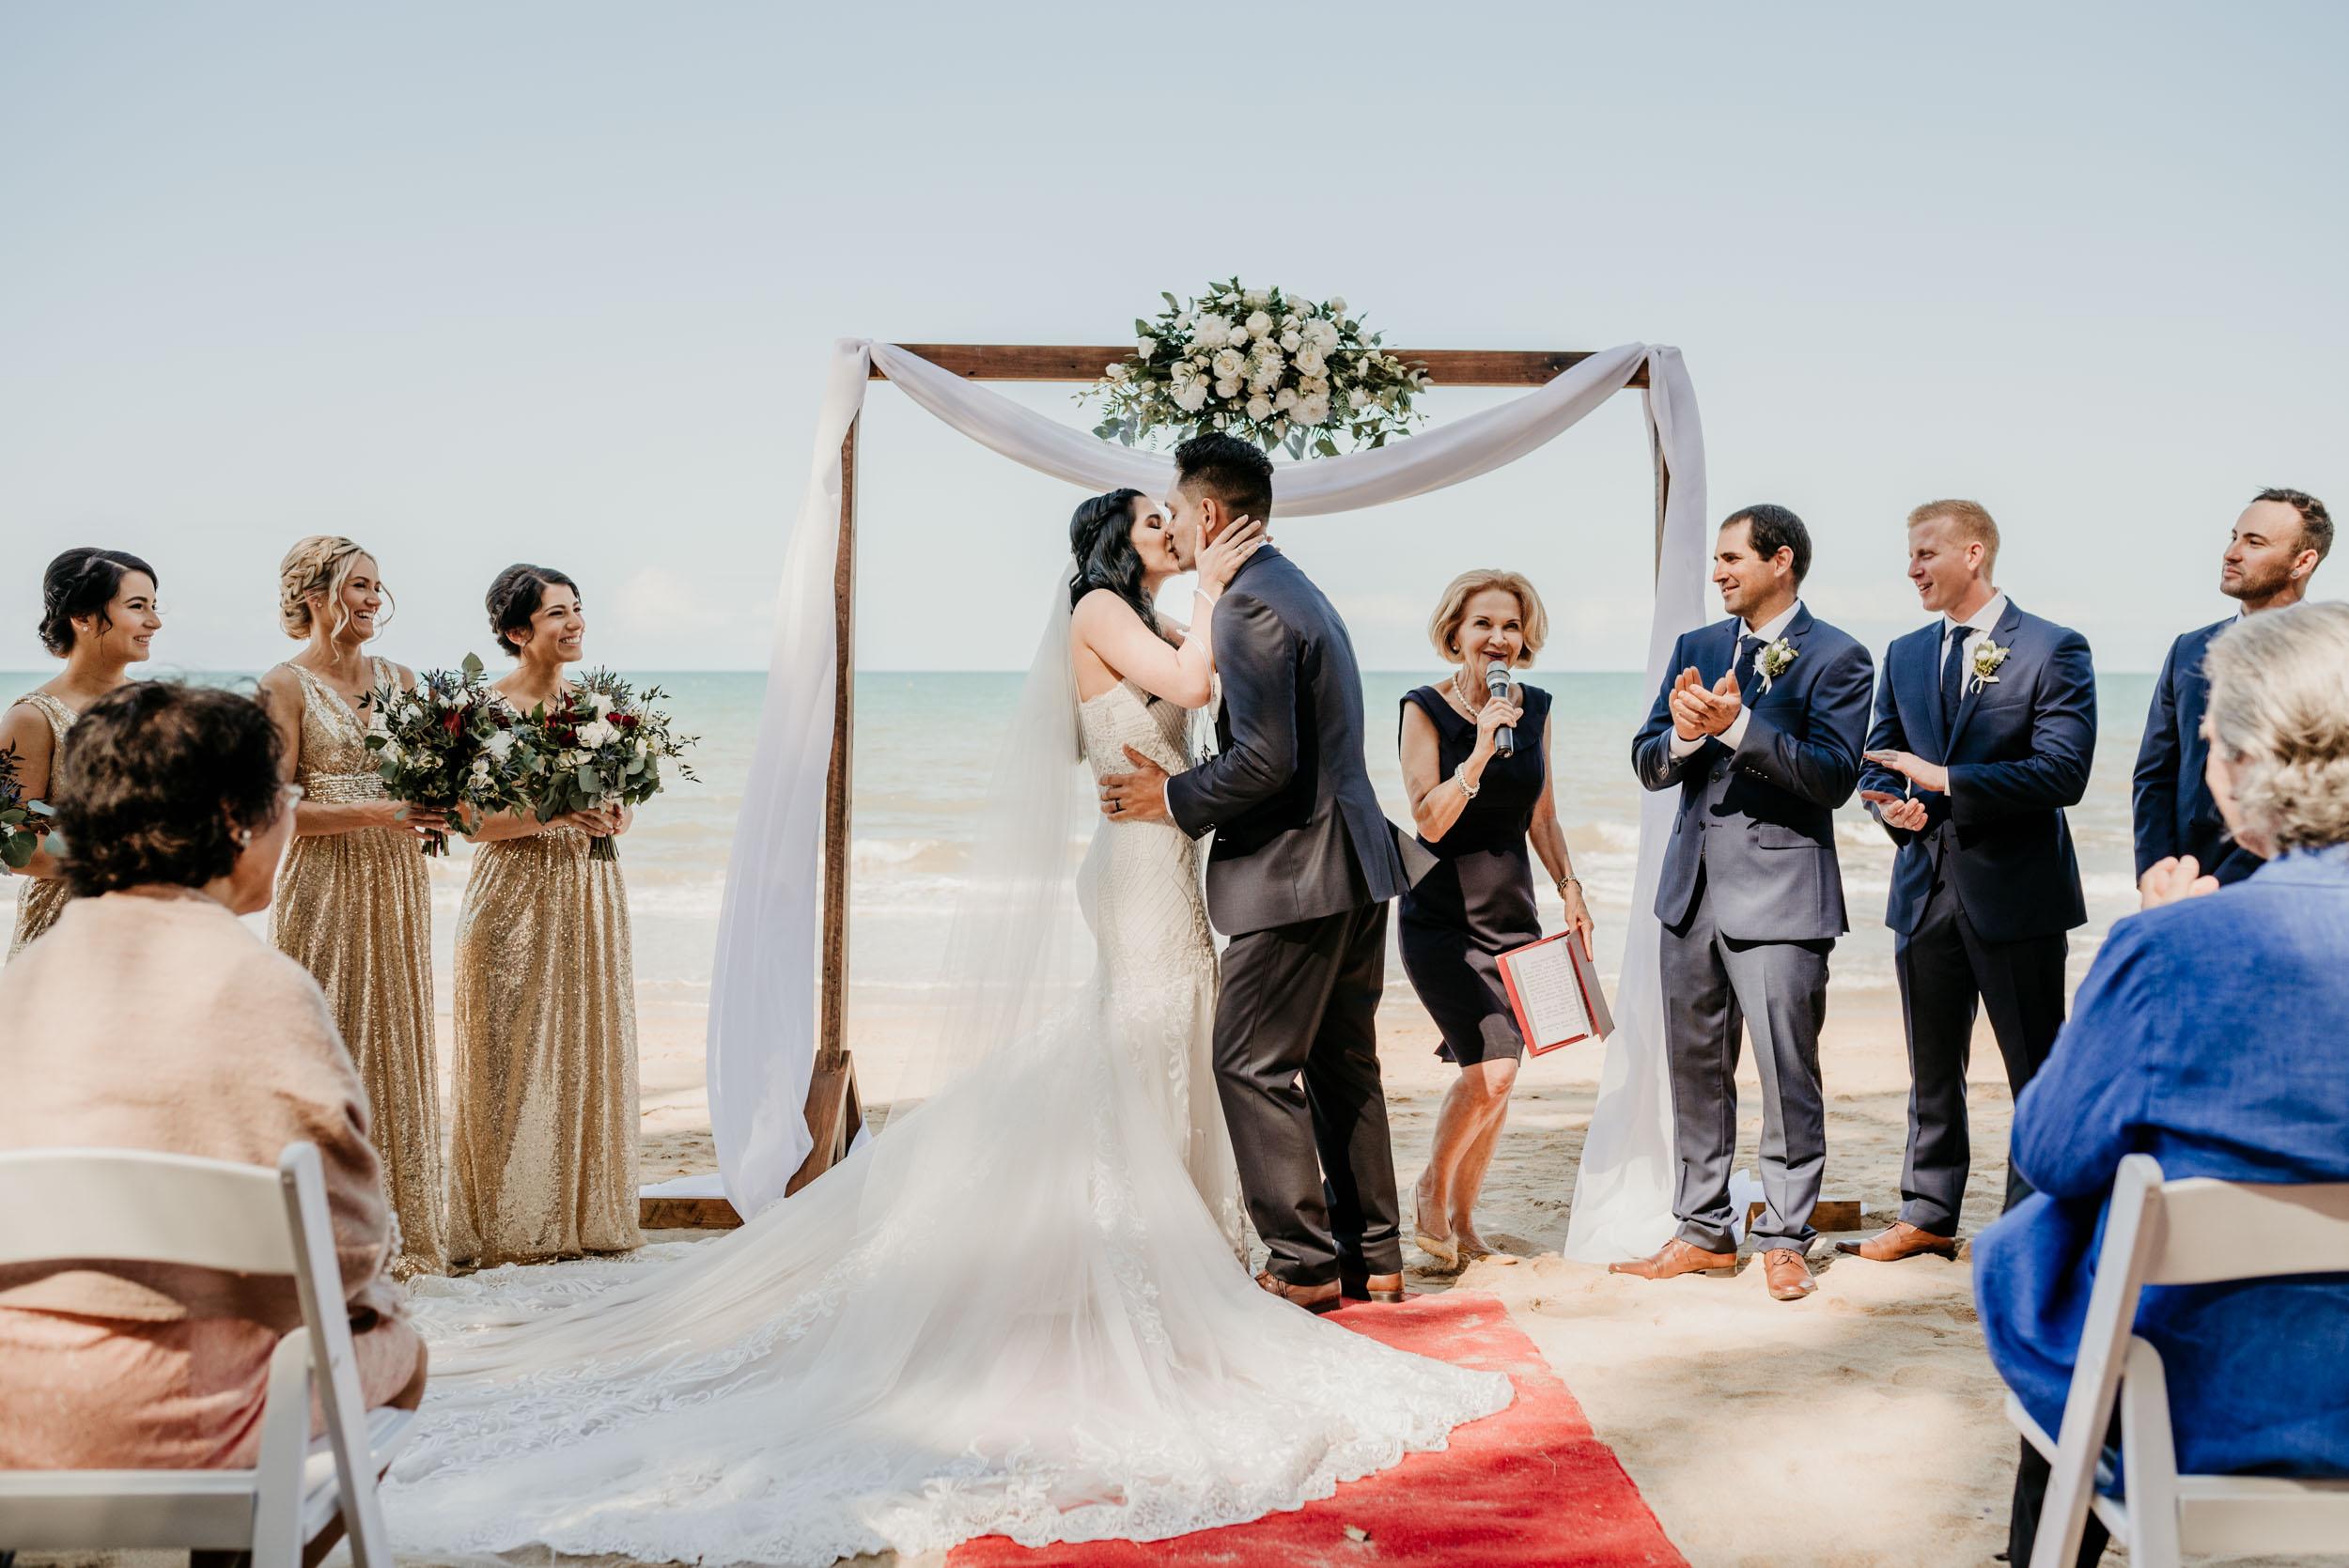 The Raw Photographer - Cairns Wedding Photographer - Beach Palm Cove Ceremony - Dress Irene Costa's Devine Bridal - Queensland-35.jpg